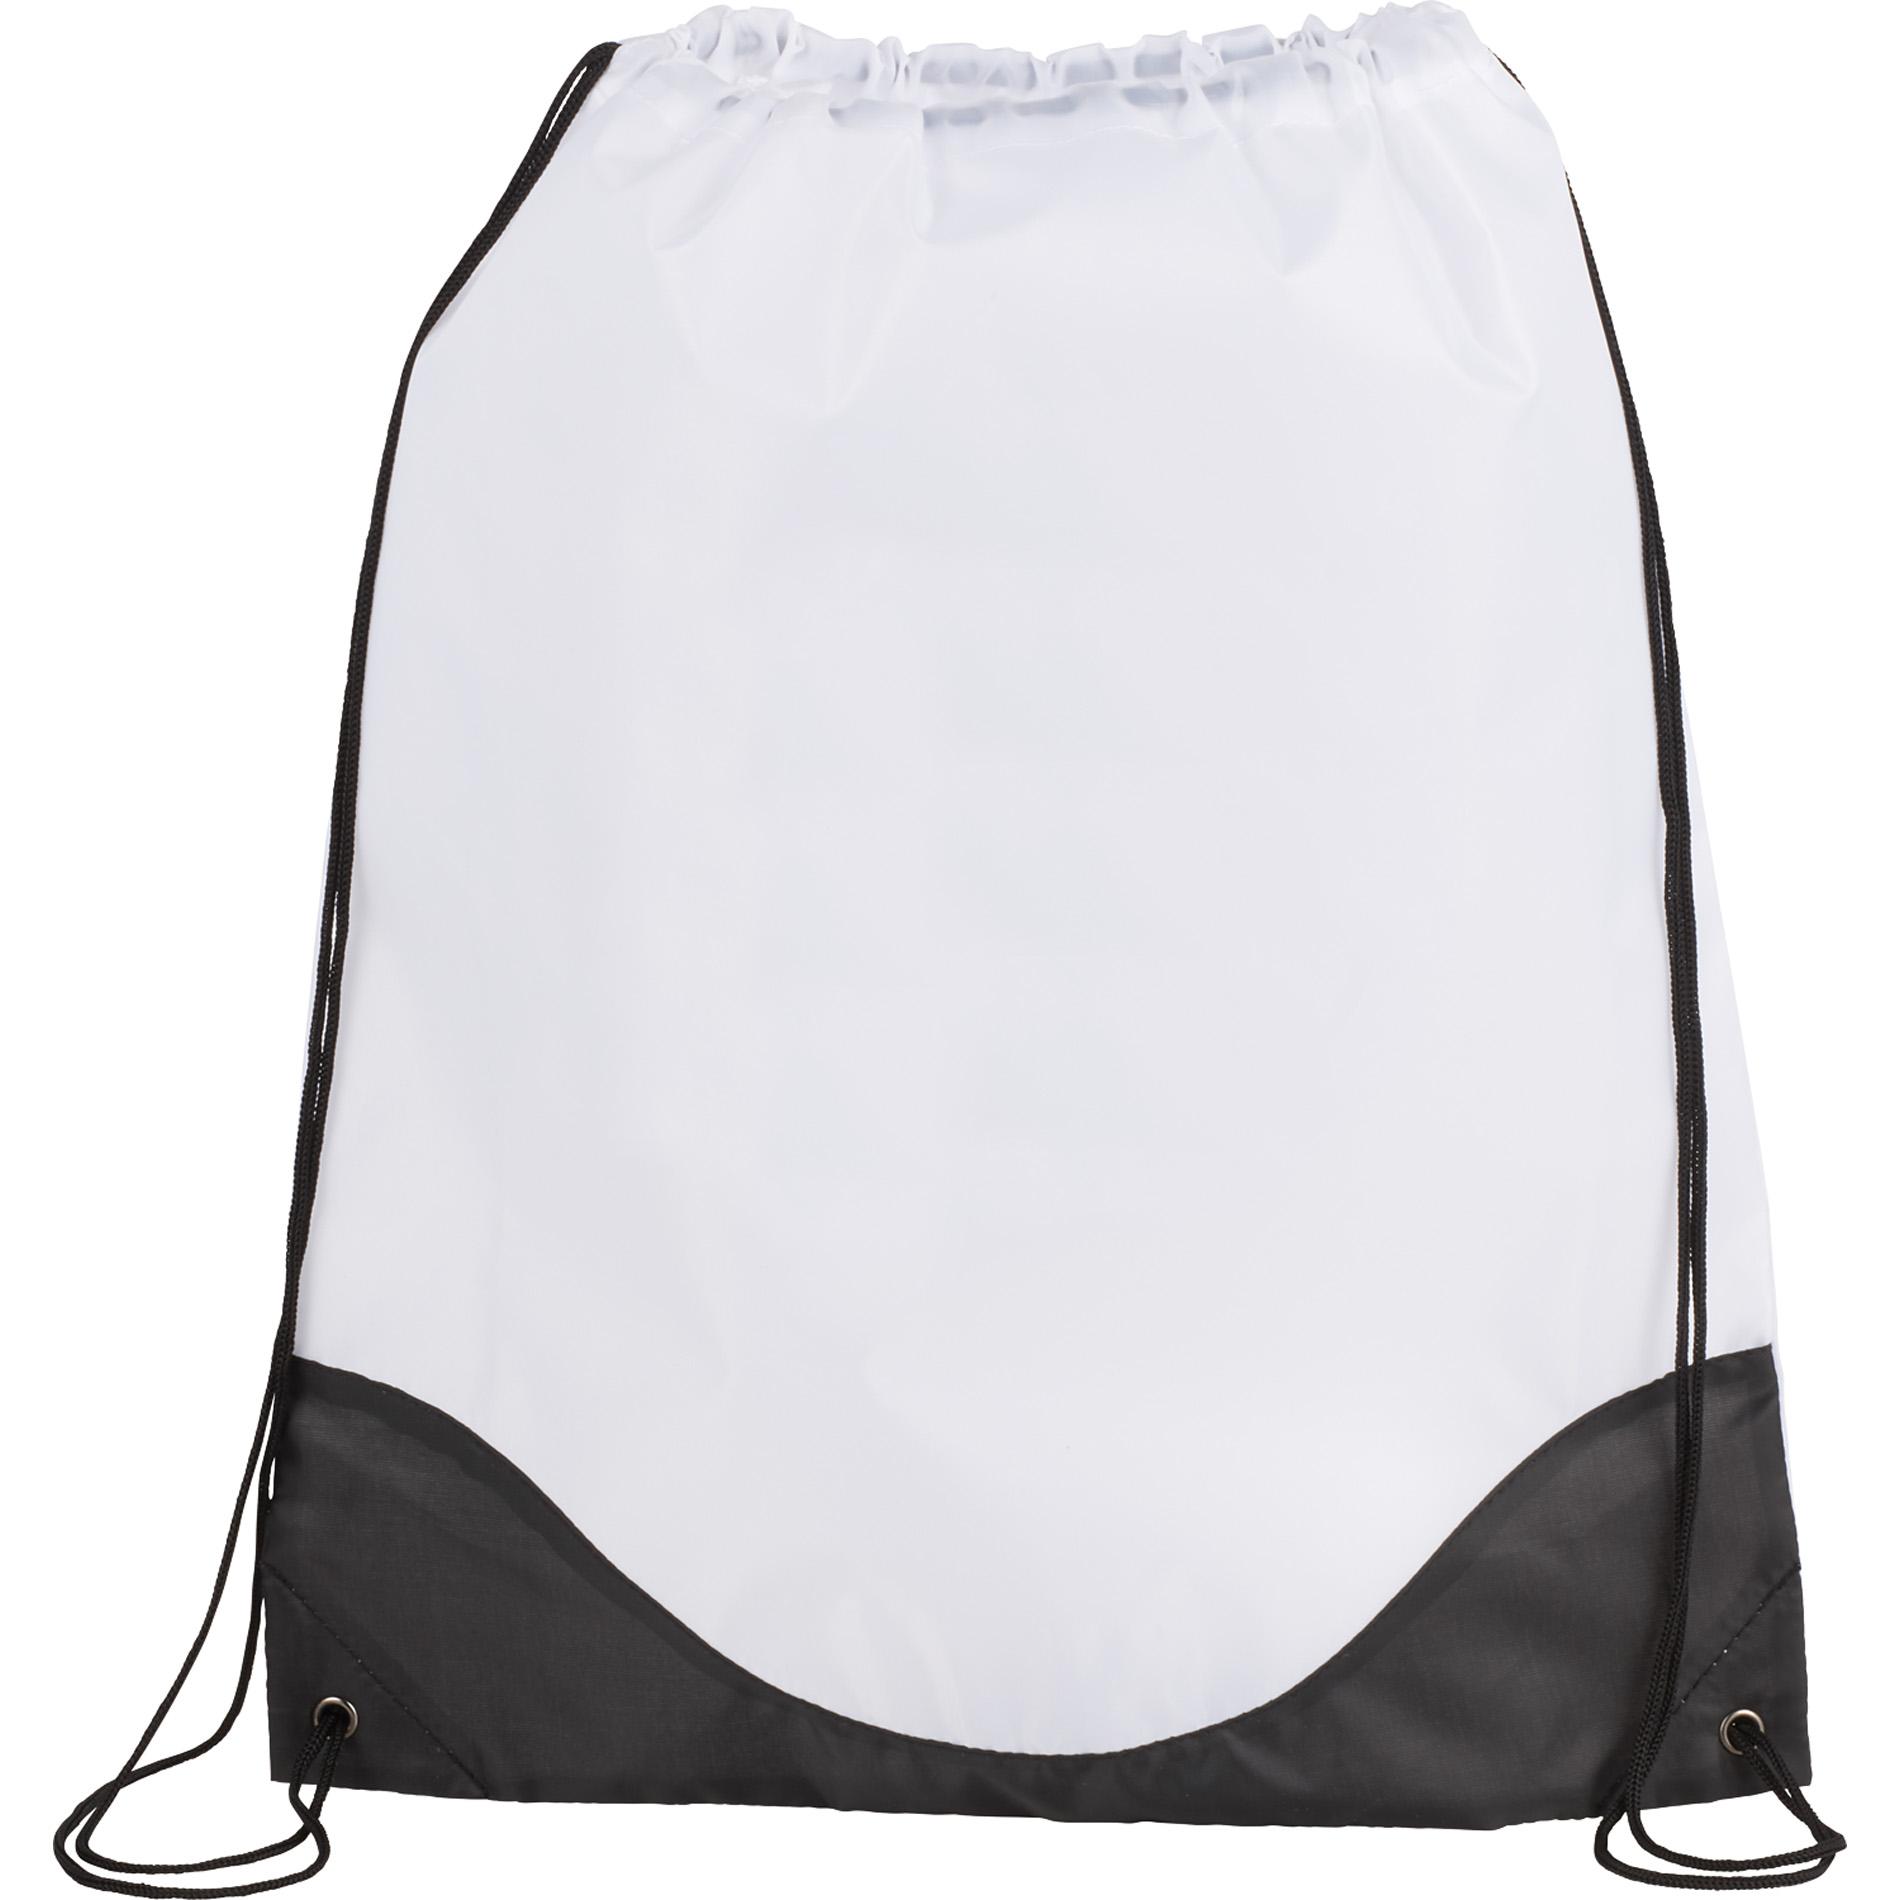 LEEDS 3005-02 - Cruz Drawstring Sportspack